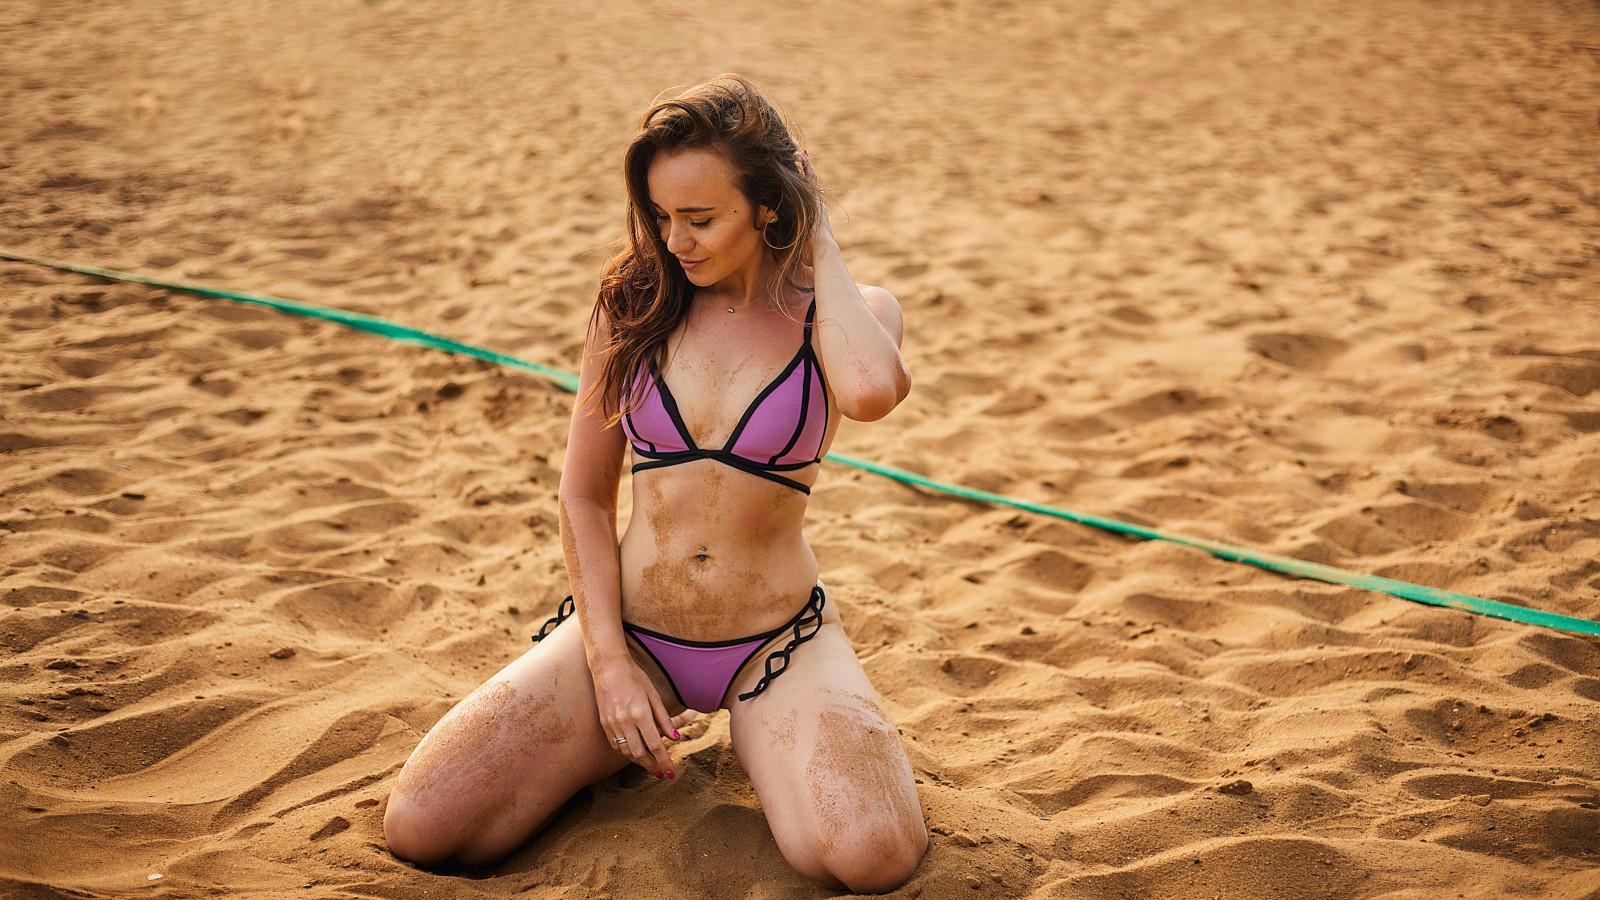 Bikini girls at lambeau field, nude naked sexy wwe girl